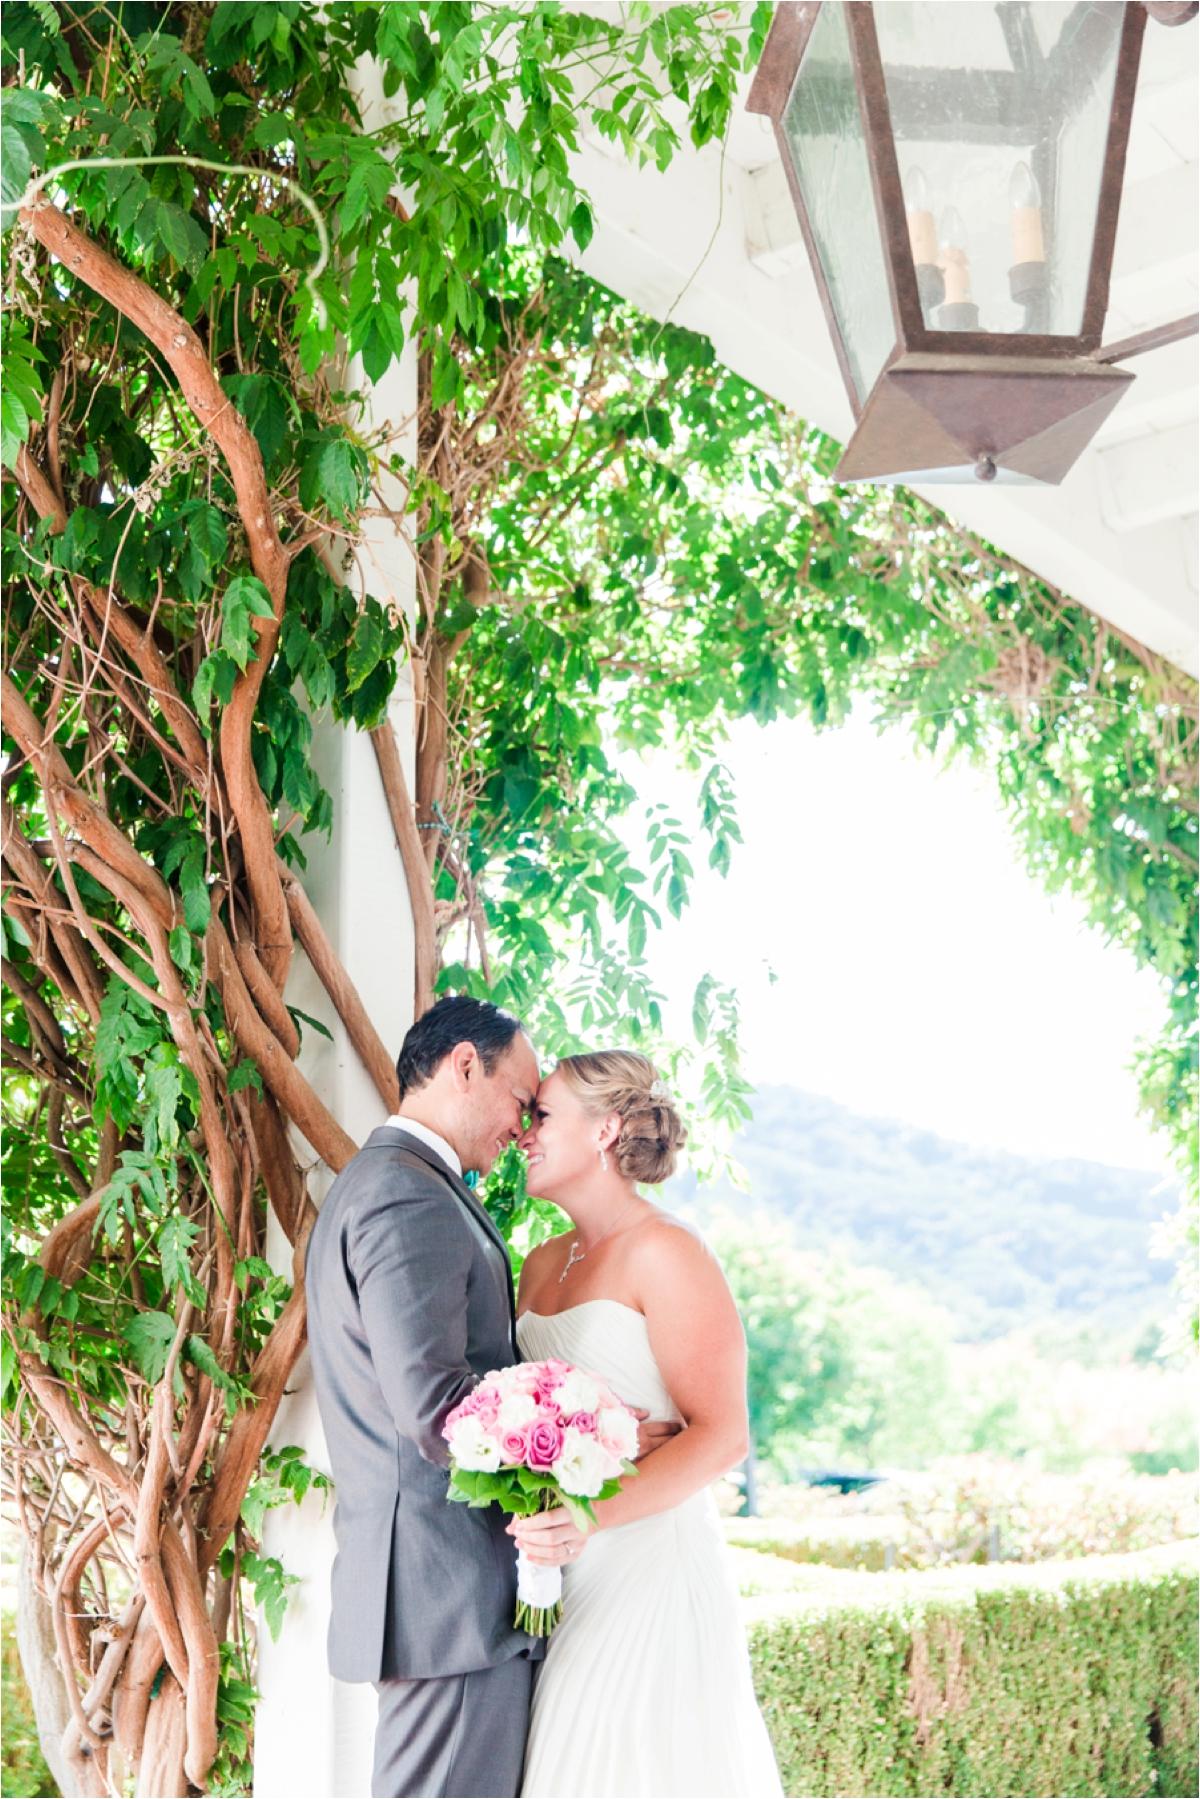 Eagle Ridge Golf Club wedding pictures by Briana Calderon Photography_0413.jpg